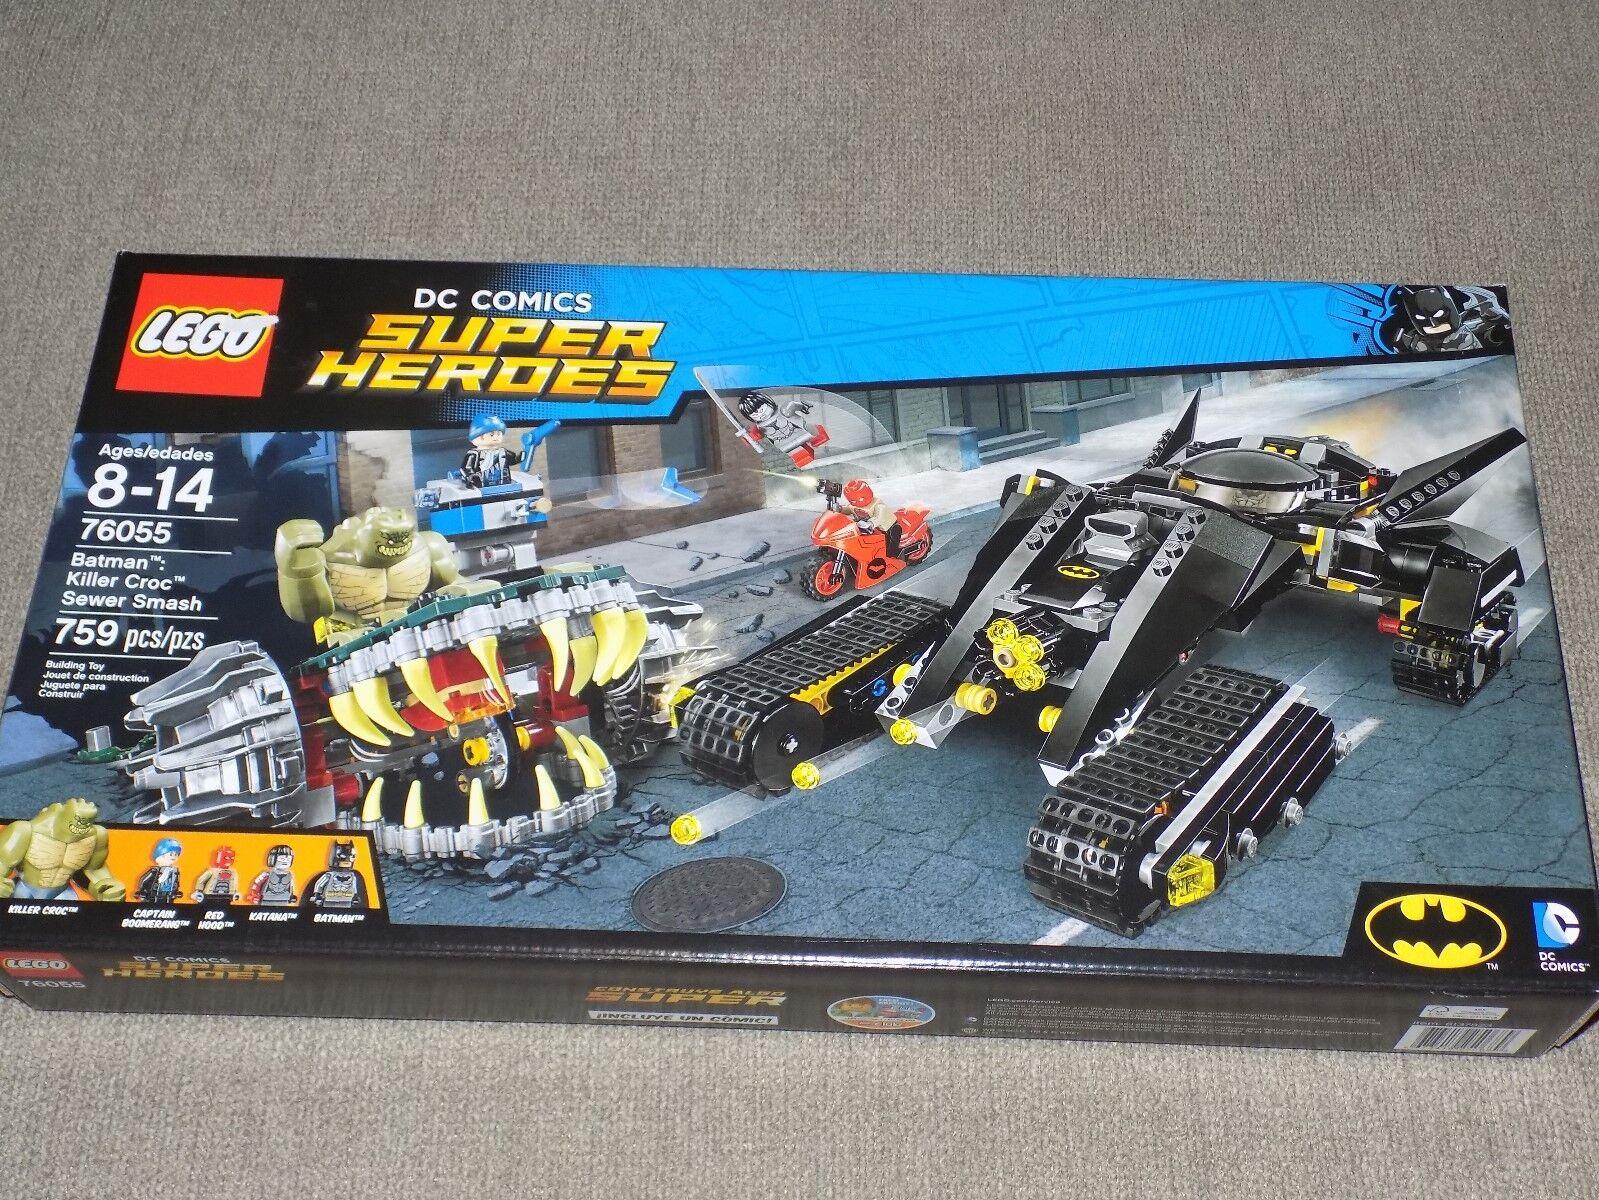 Dc Smash76055Killer Sewer Batman Comics Super Heroes Croc Lego 6bgyvI7Yf